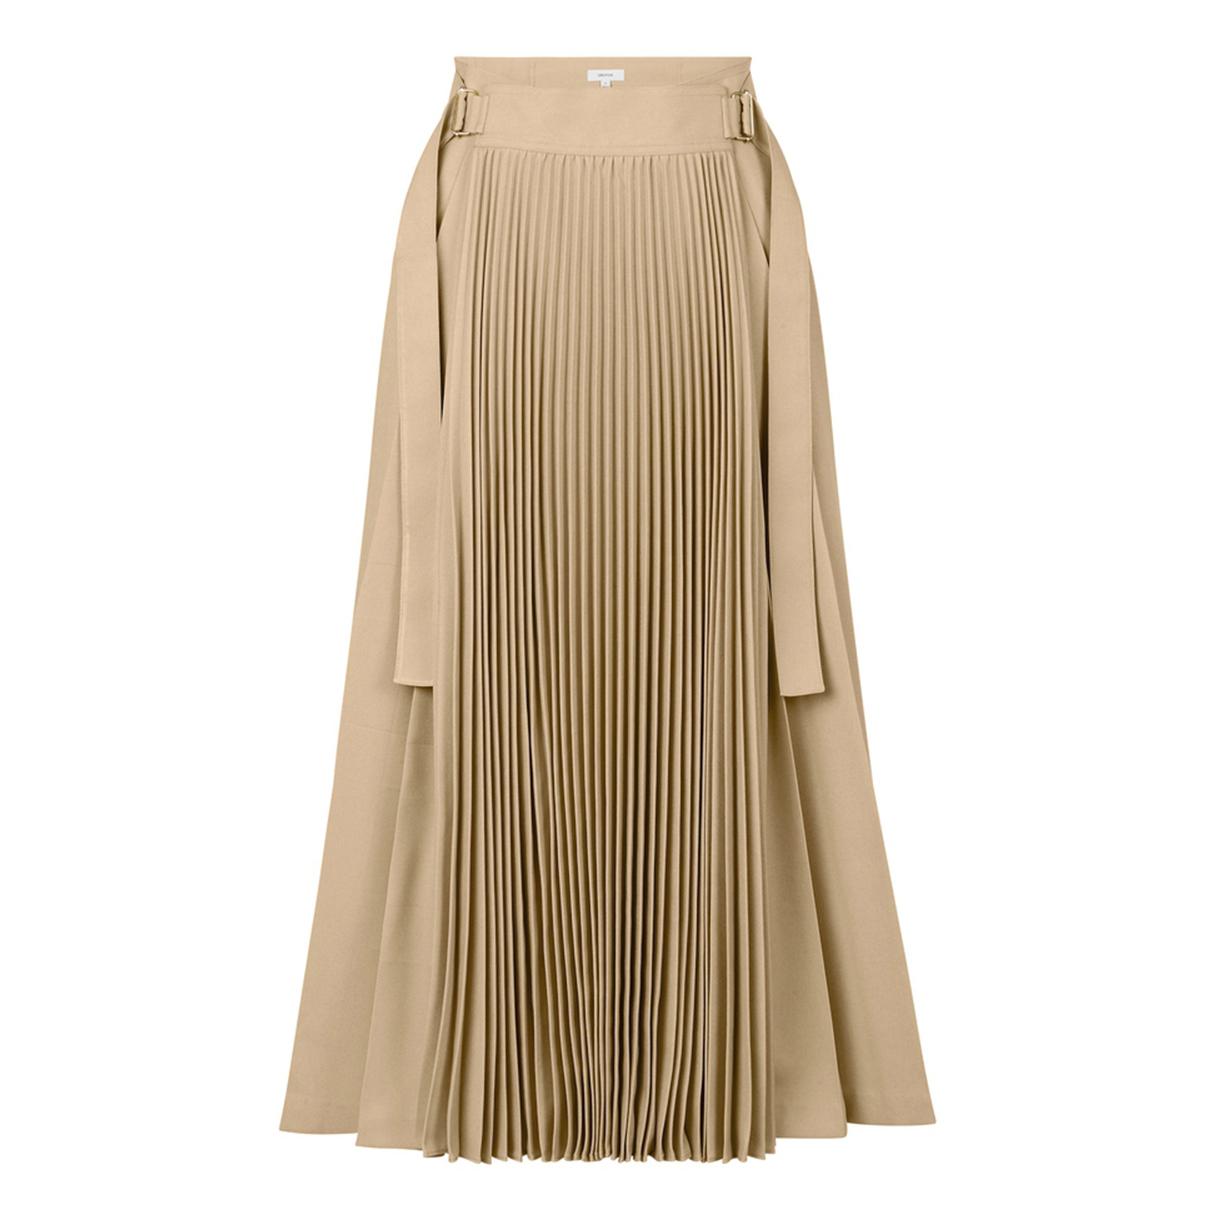 Oroton Tab Detail Contrast Pleat Skirt